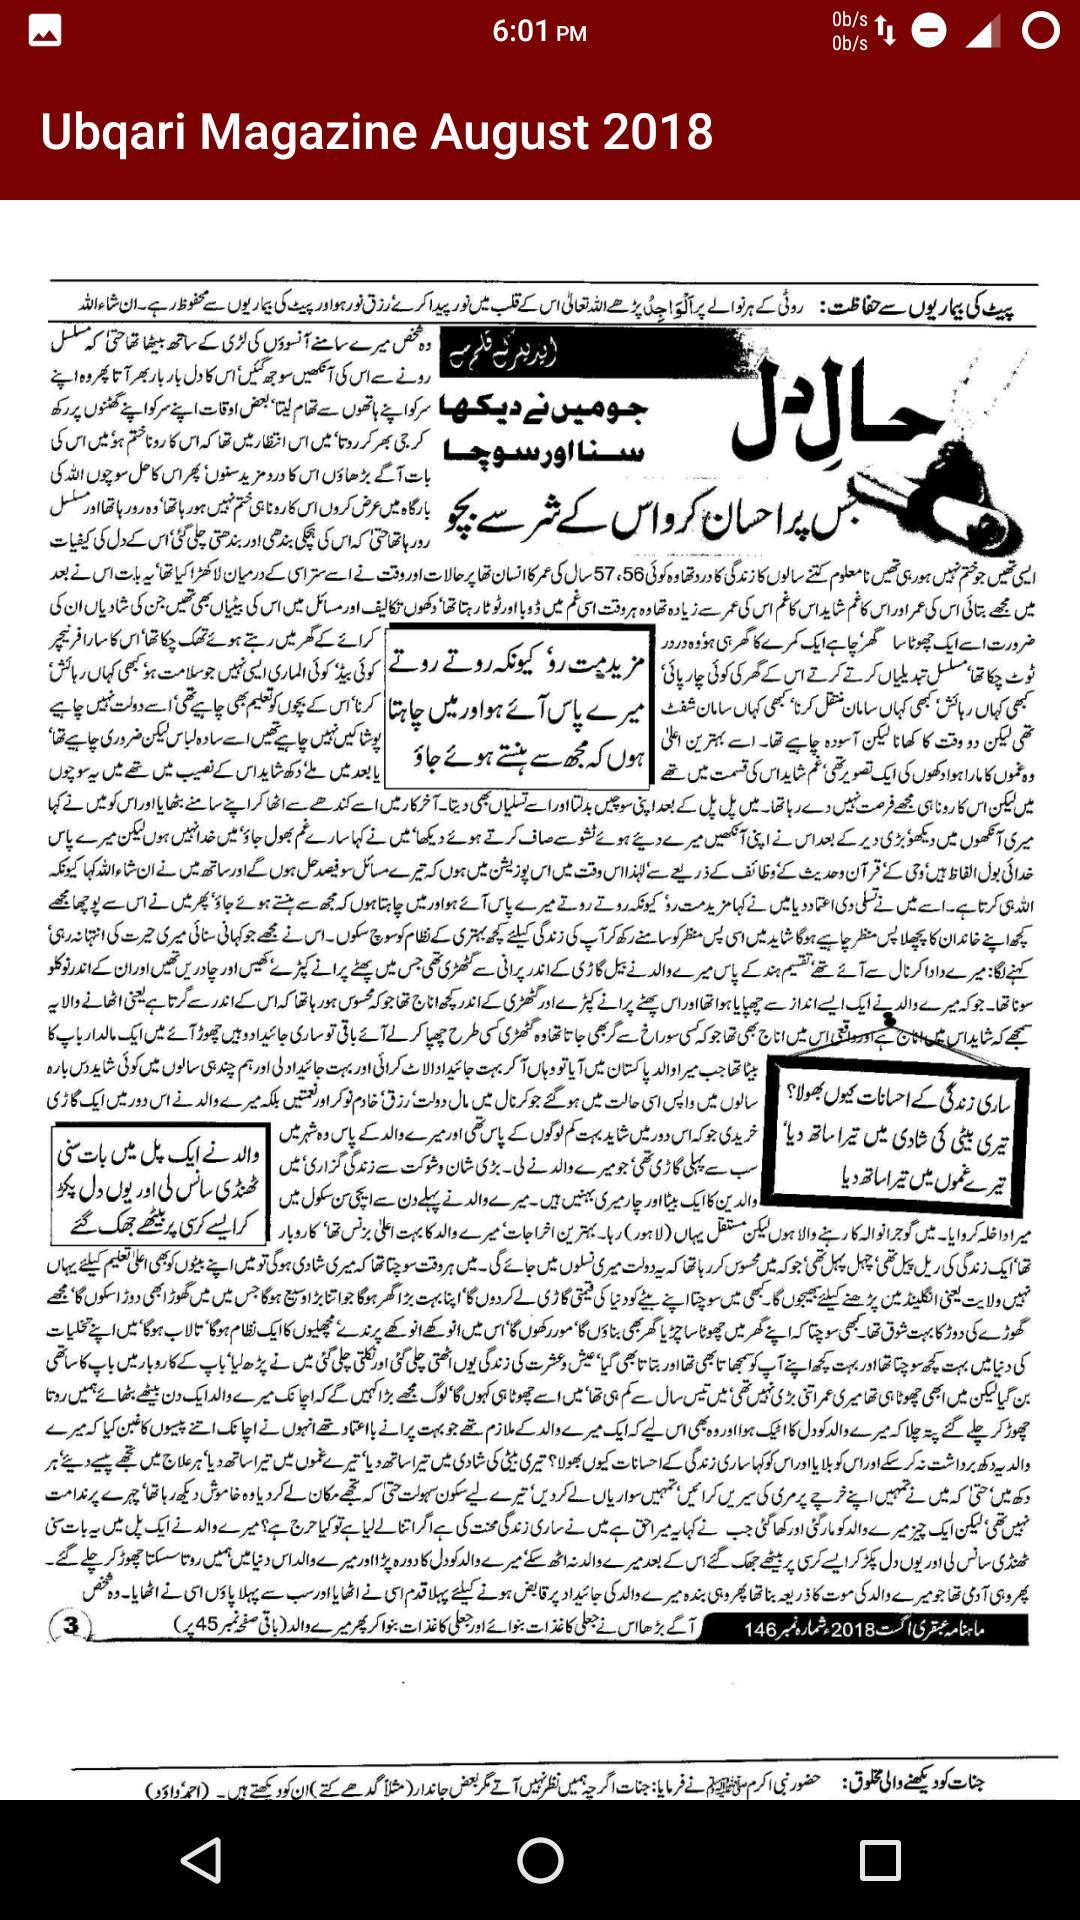 Ubqari Magazine August 2018 for Android - APK Download